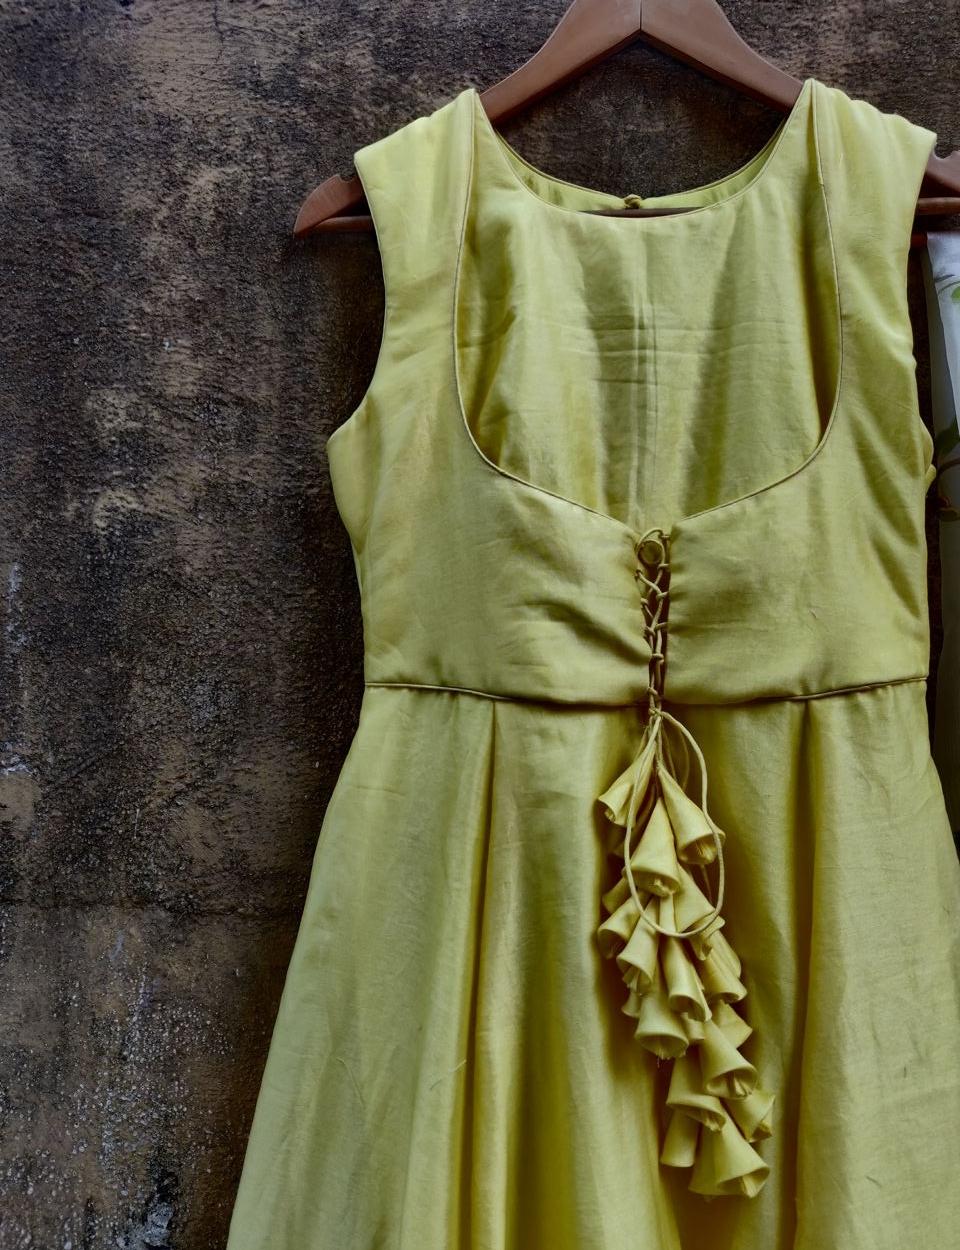 Lemon Anarkali with Hand Painted Dupatta - Fashion Brand & Designer Priti Sahni 6